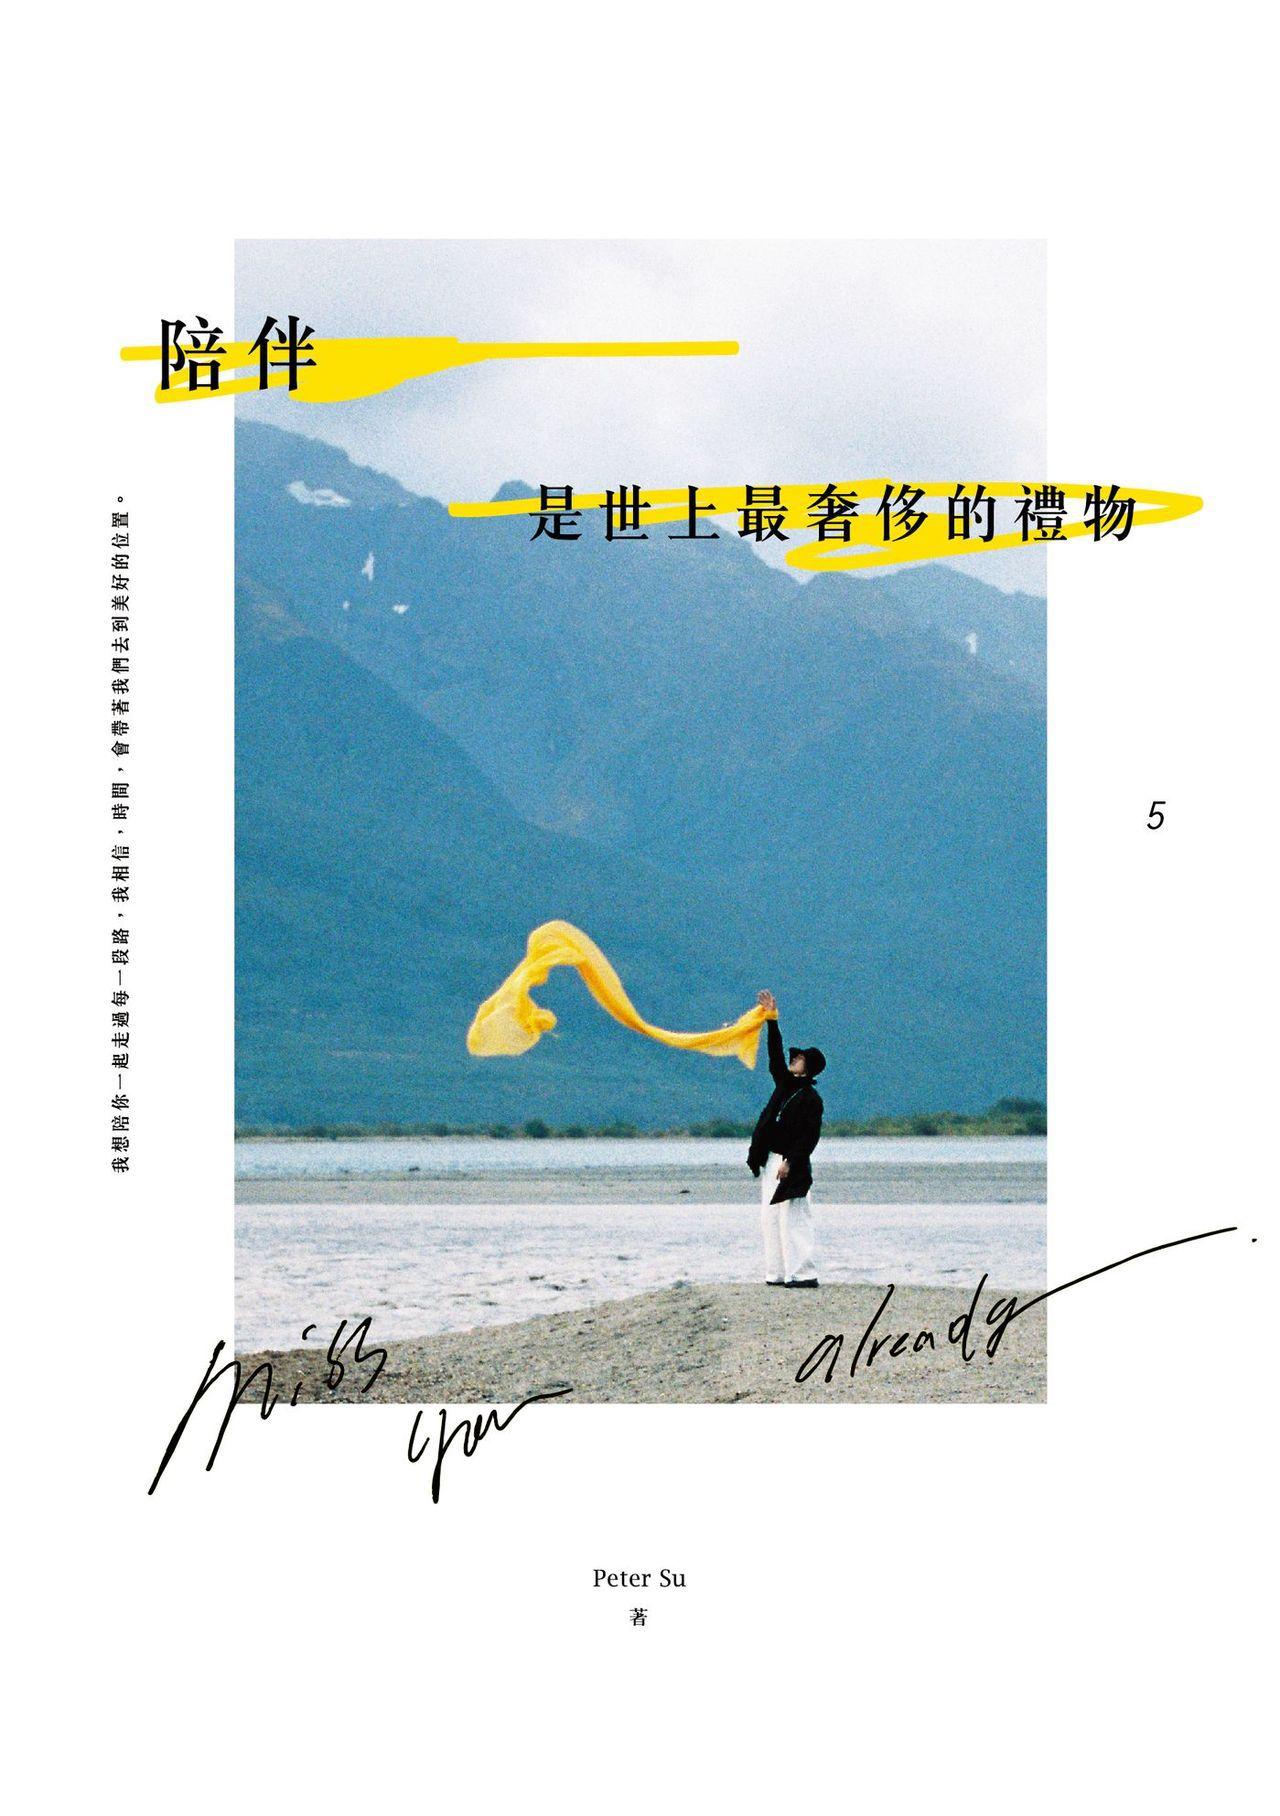 Peter Su的《陪伴,是世上最奢侈的禮物》,登上台灣與香港暢銷書年度TOP1...